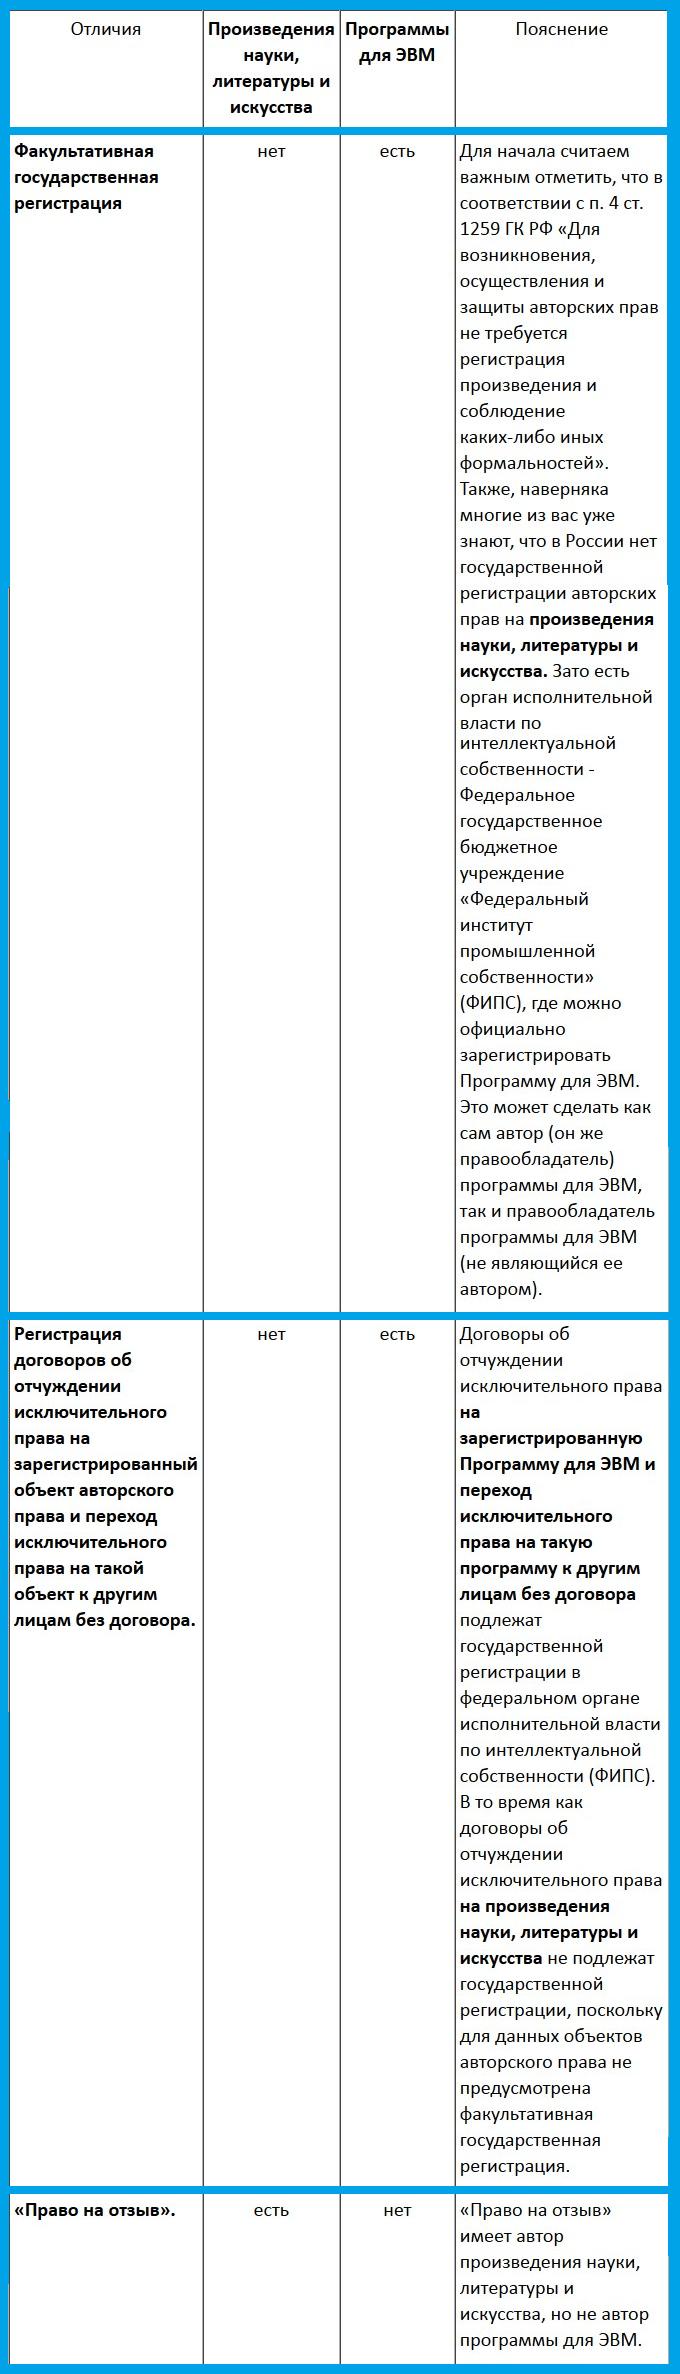 регистрация программ эвм